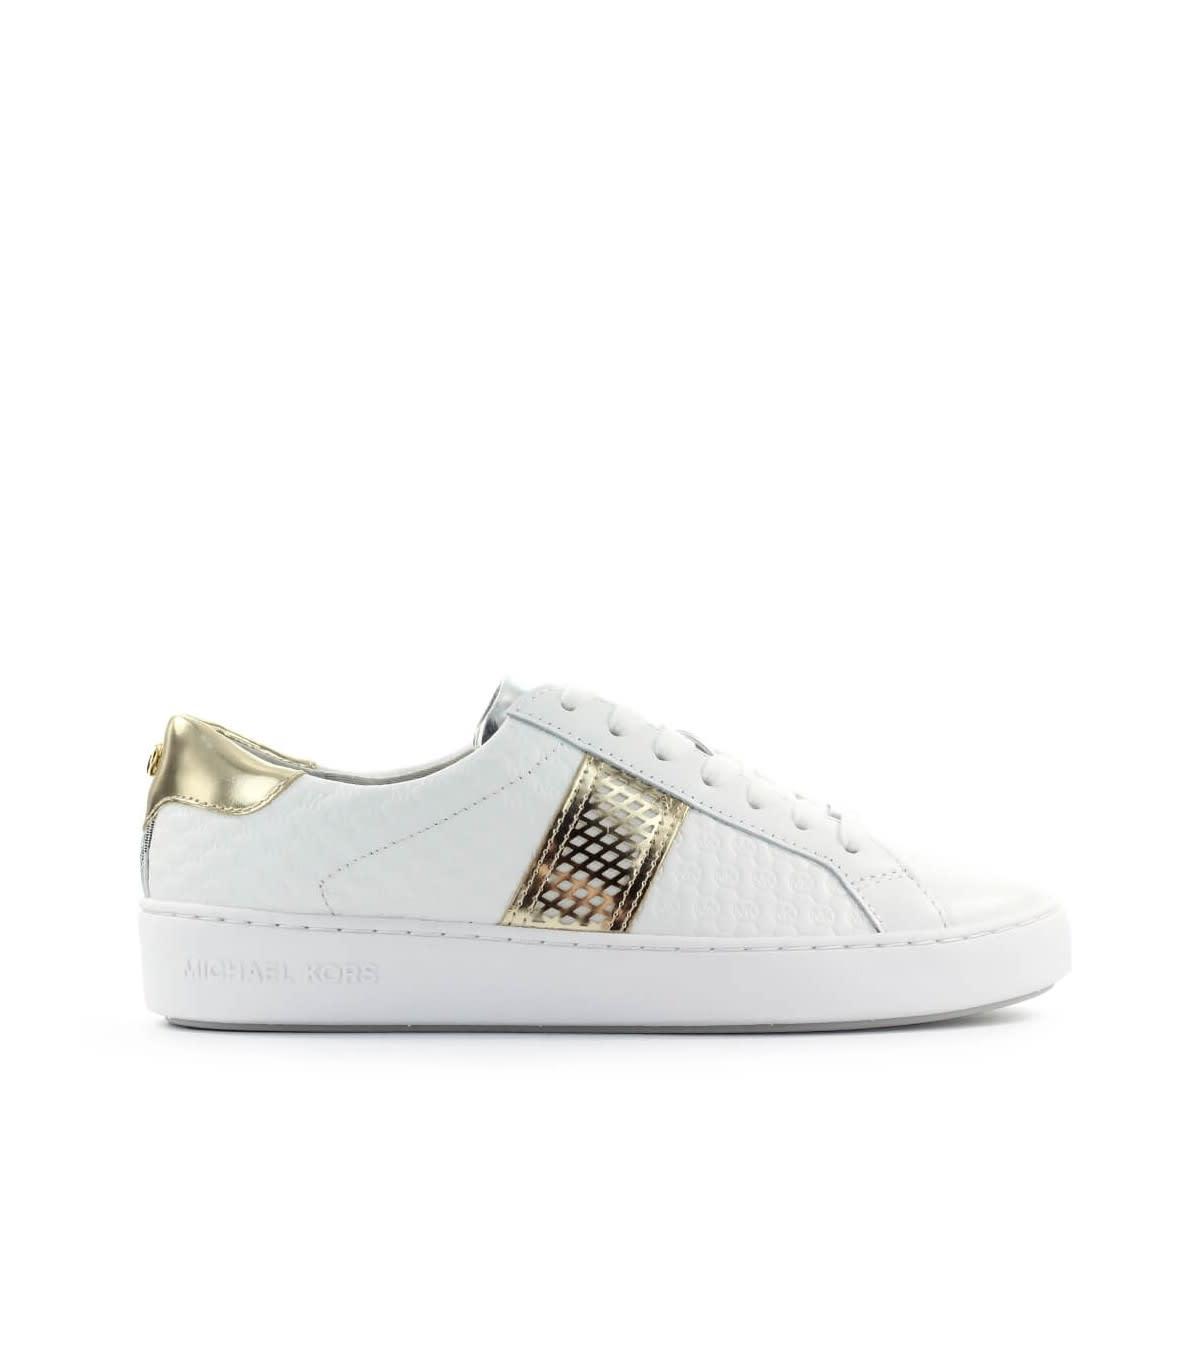 Michael Kors Irving Stripe Lace Up White Sneaker